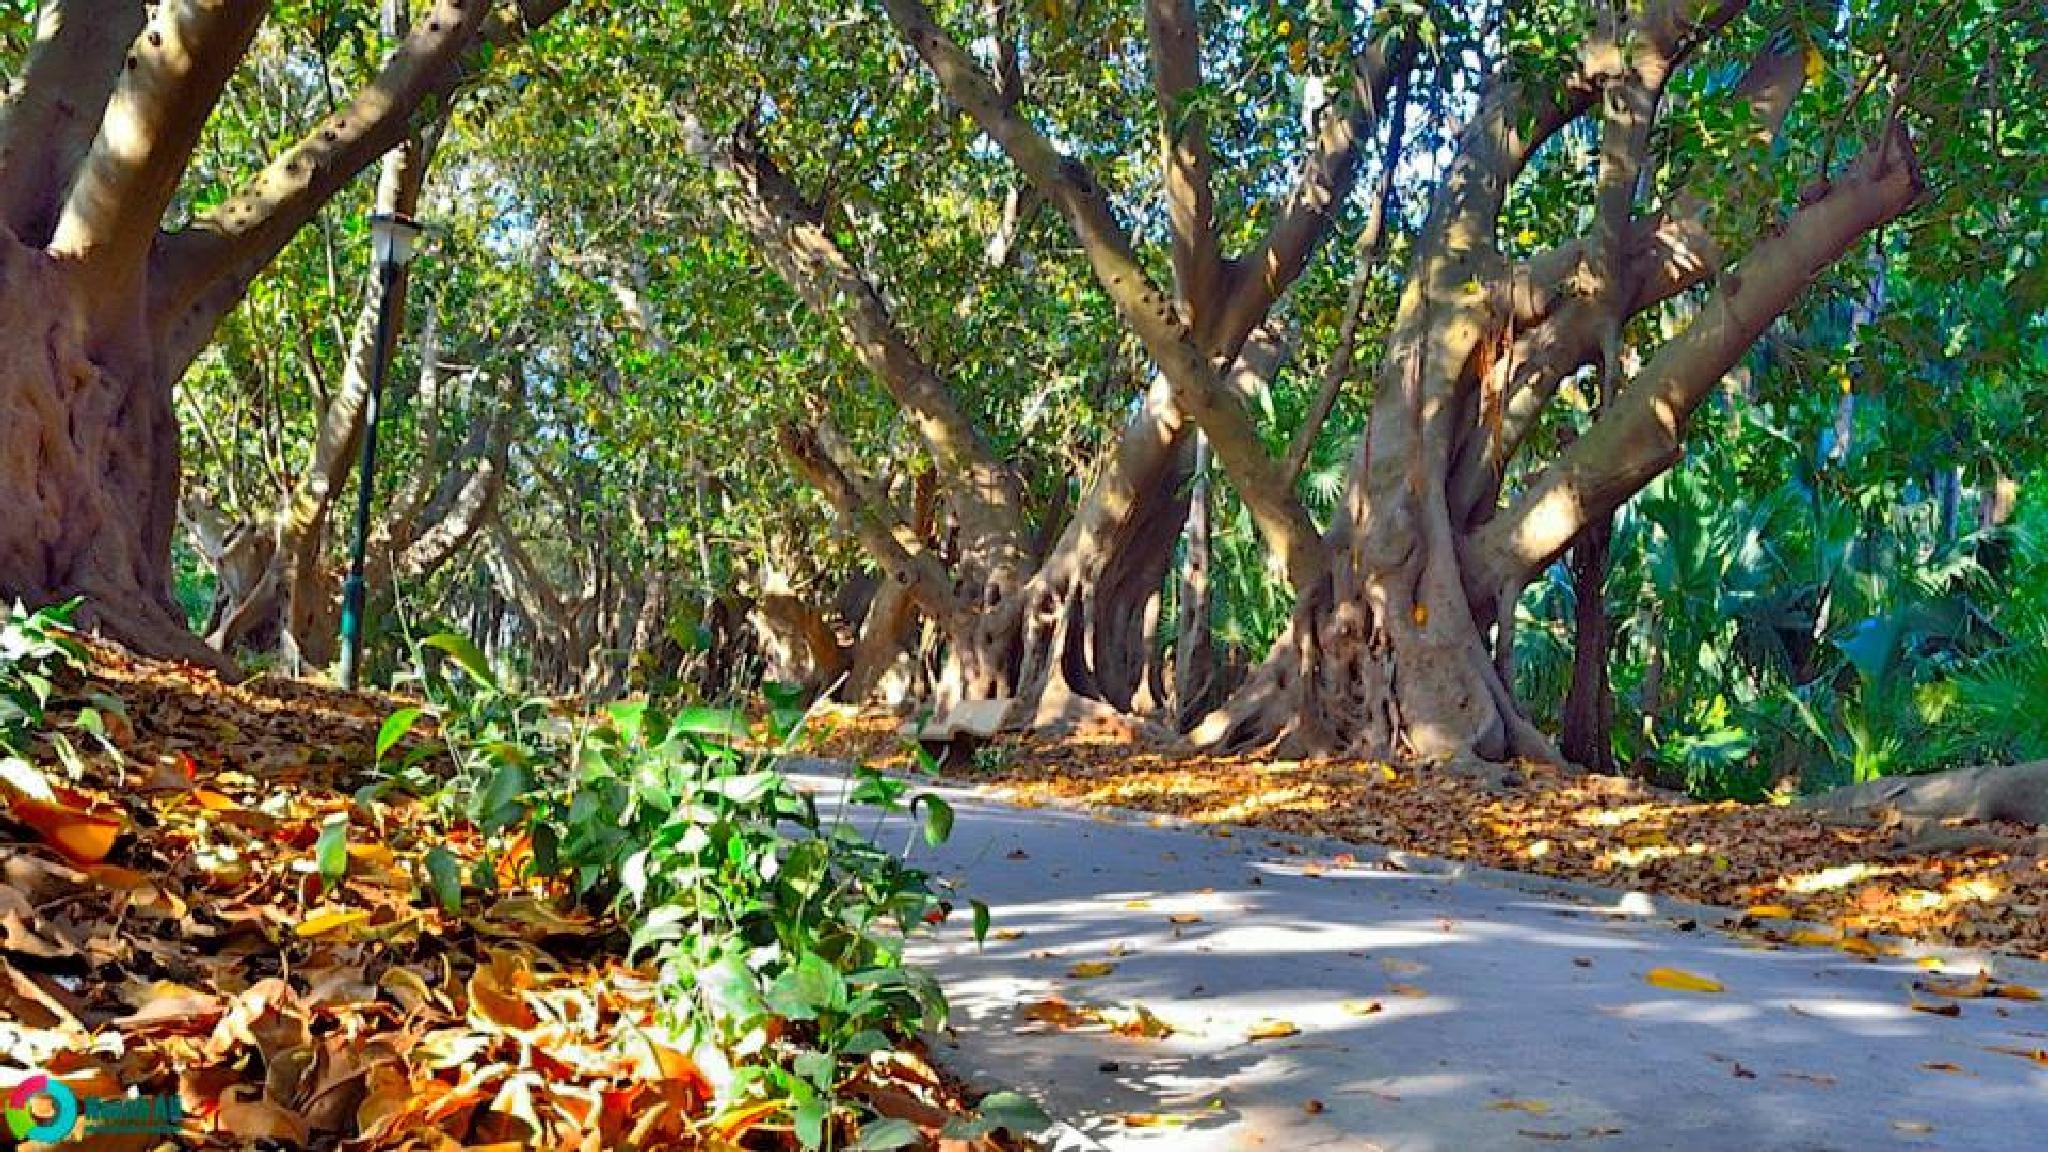 Botanical Garden Hamma, Algeria by nouah ali